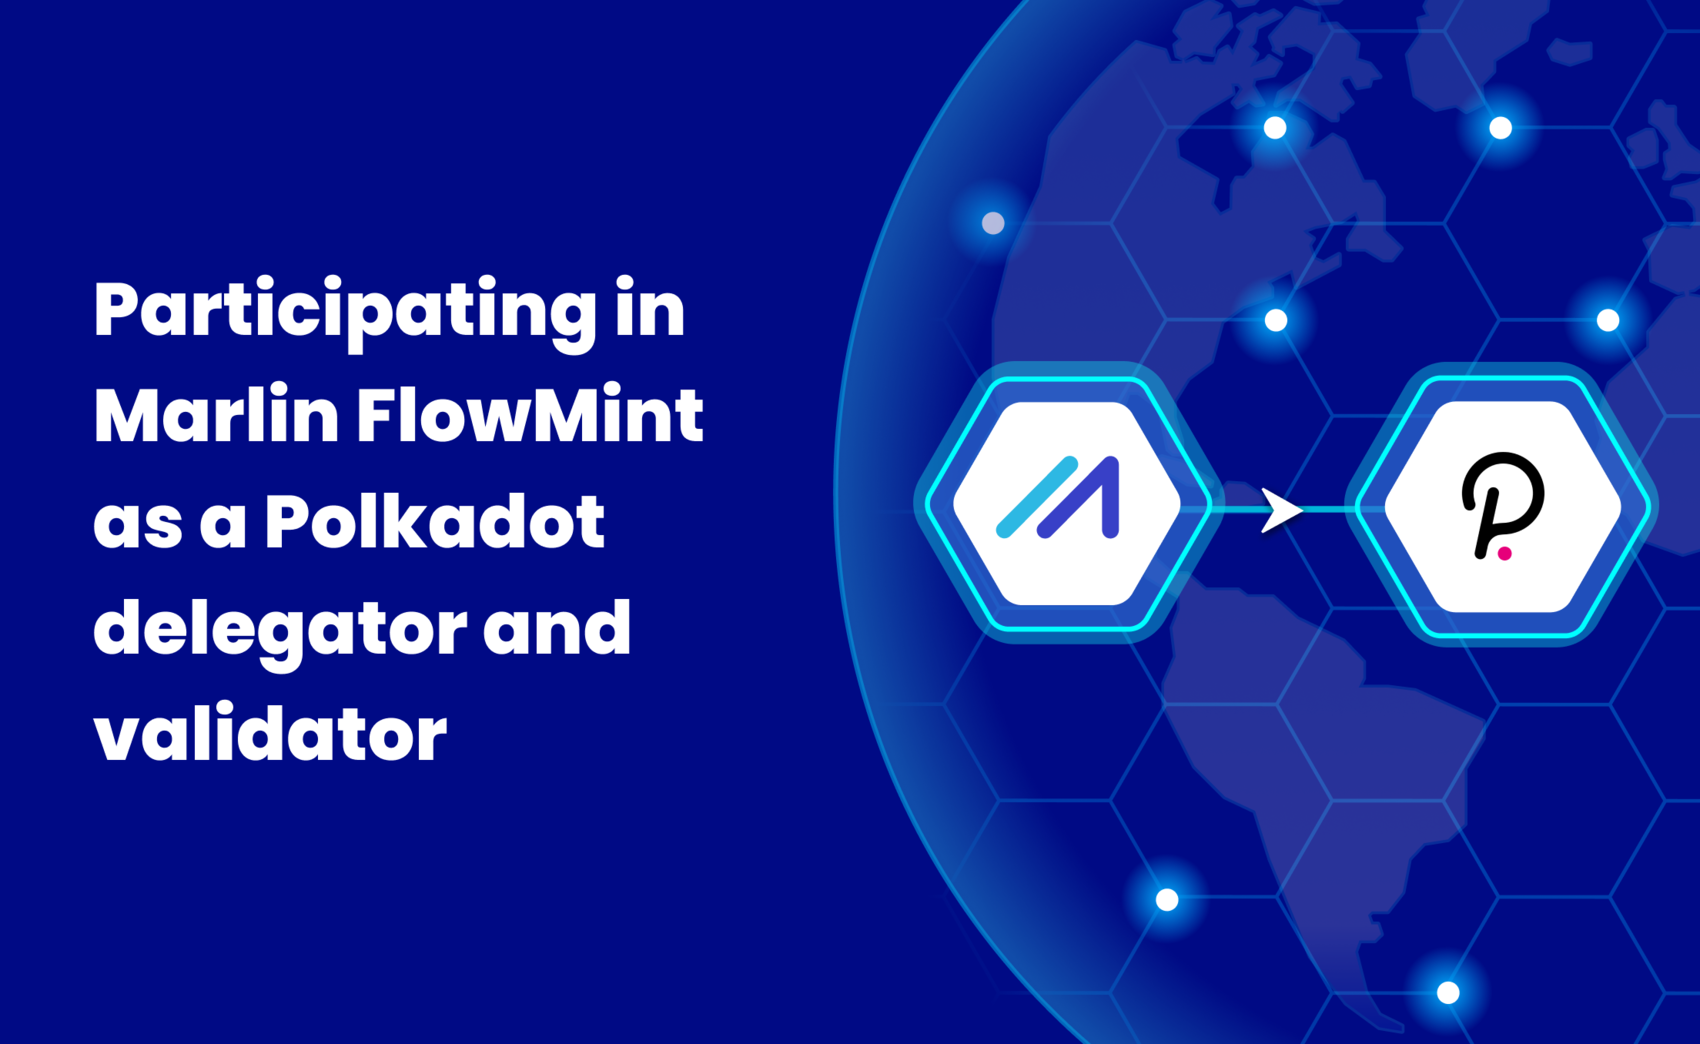 Participating in Marlin FlowMint as a Polkadot delegator and validator